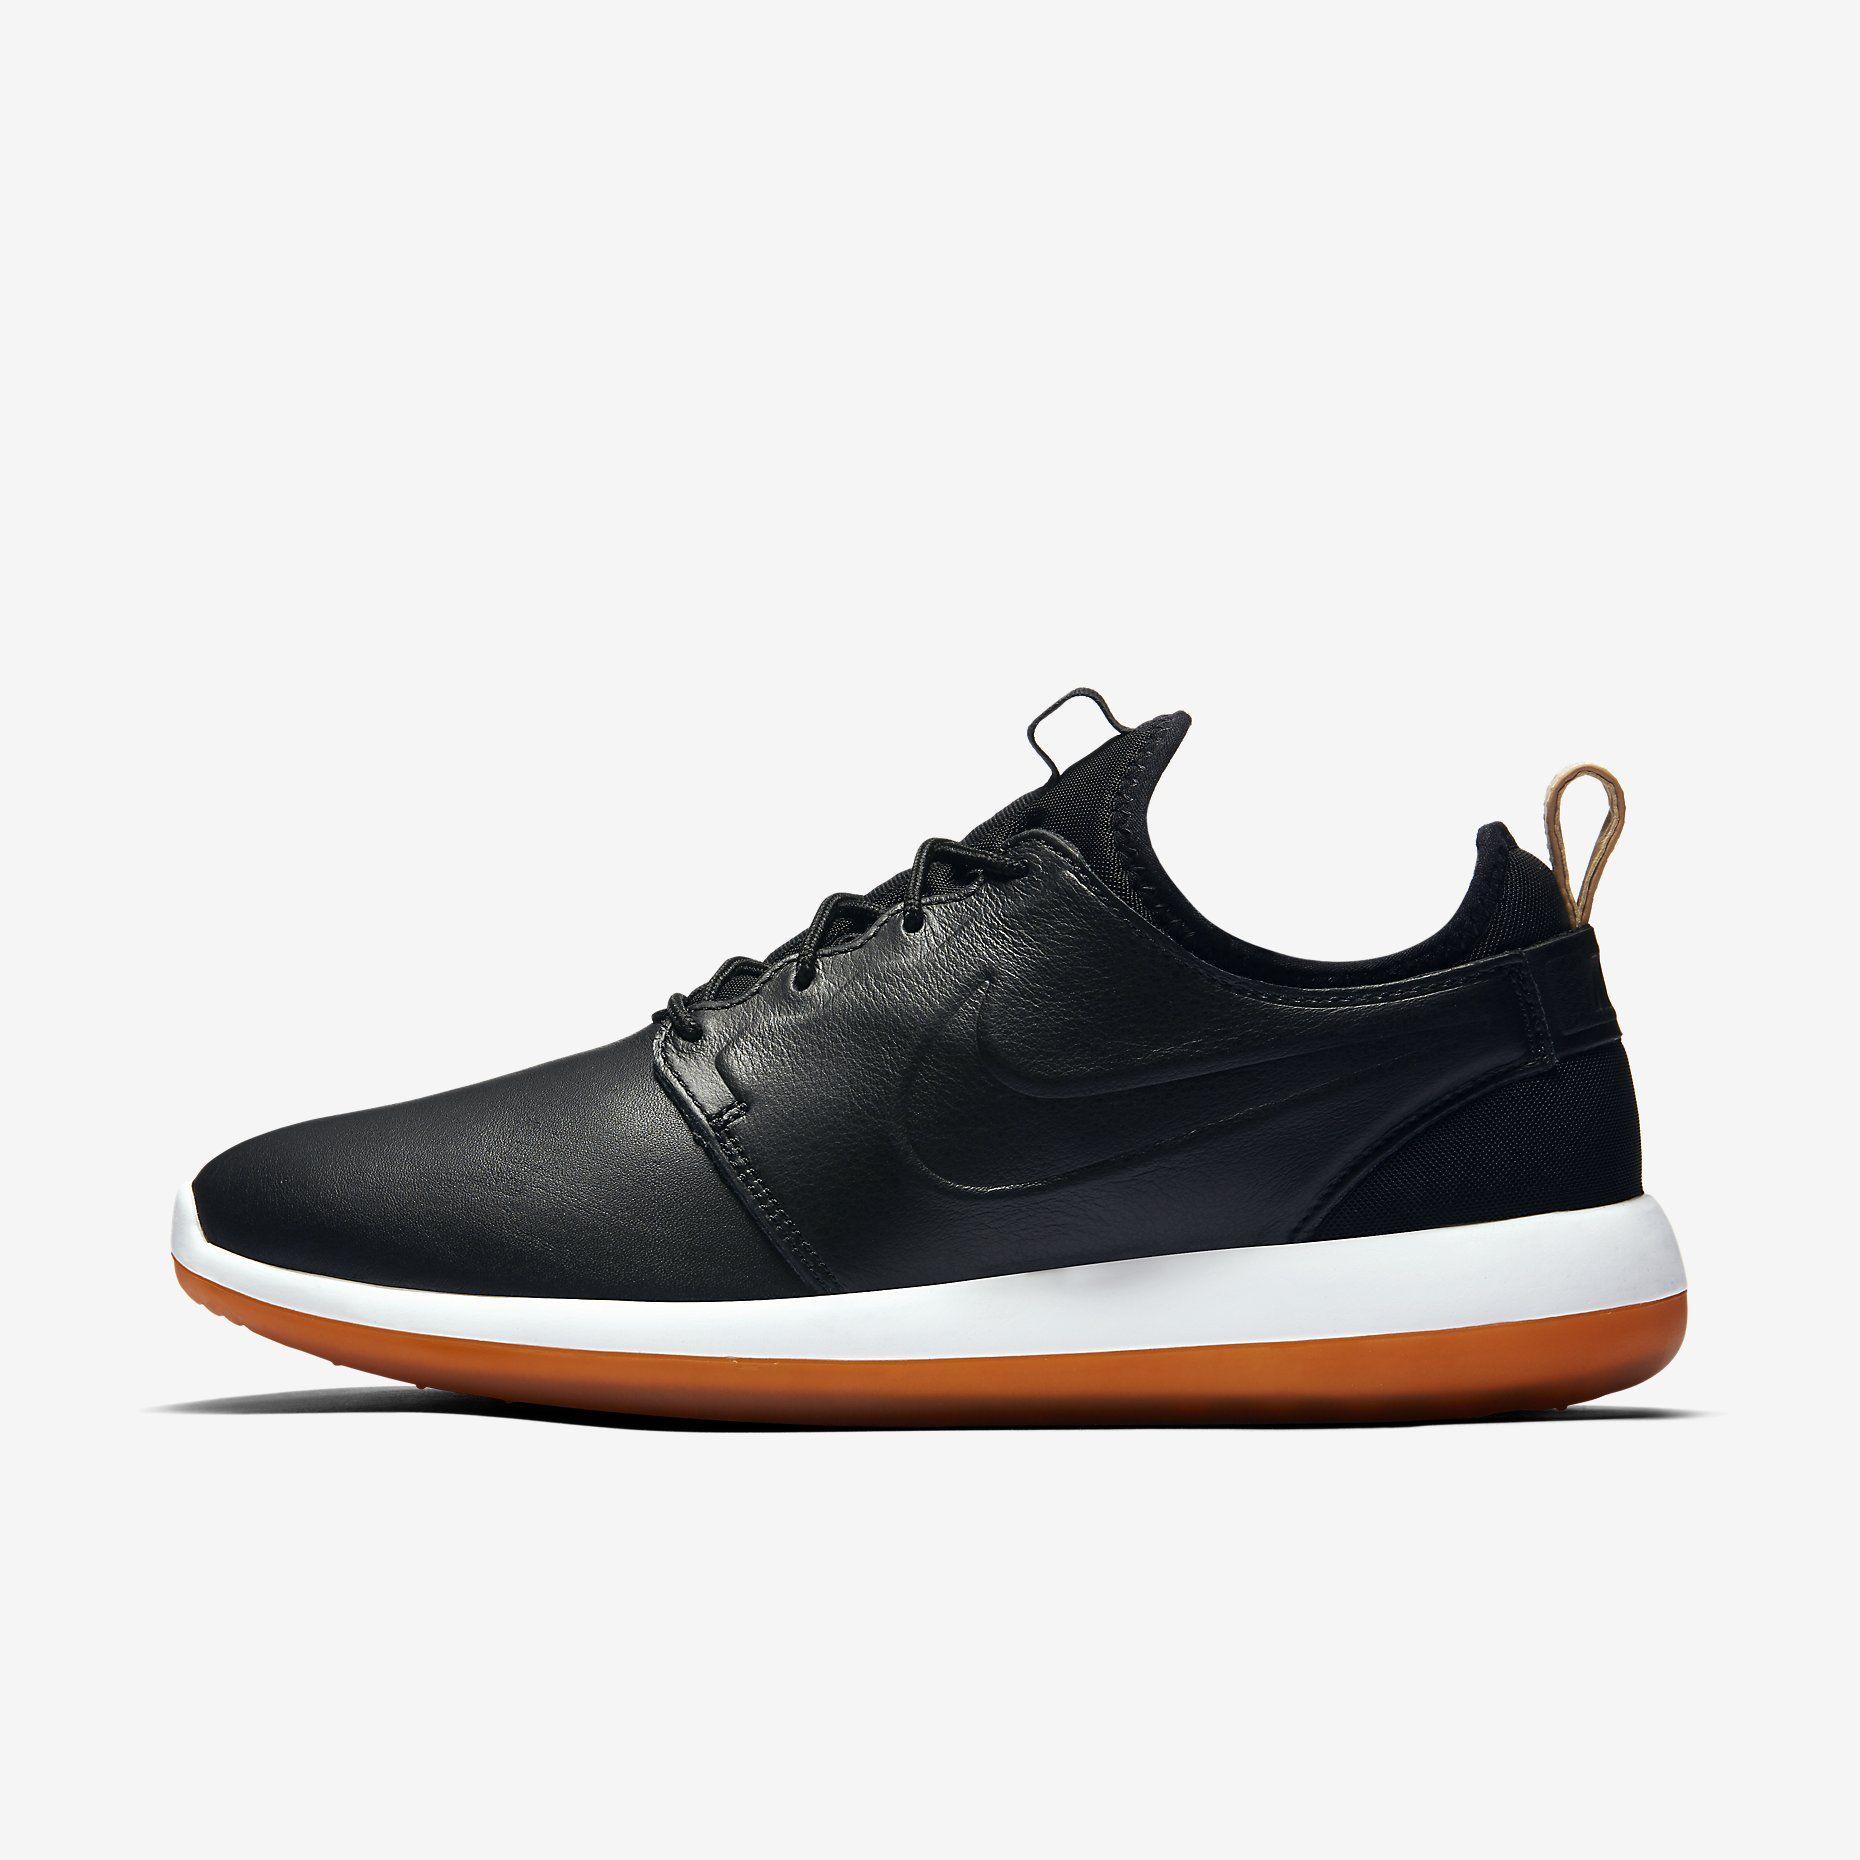 pretty nice a7cf5 9b886 Nike Roshe 2 Leather Premium | Fresh Kicks | Nike shoes ...